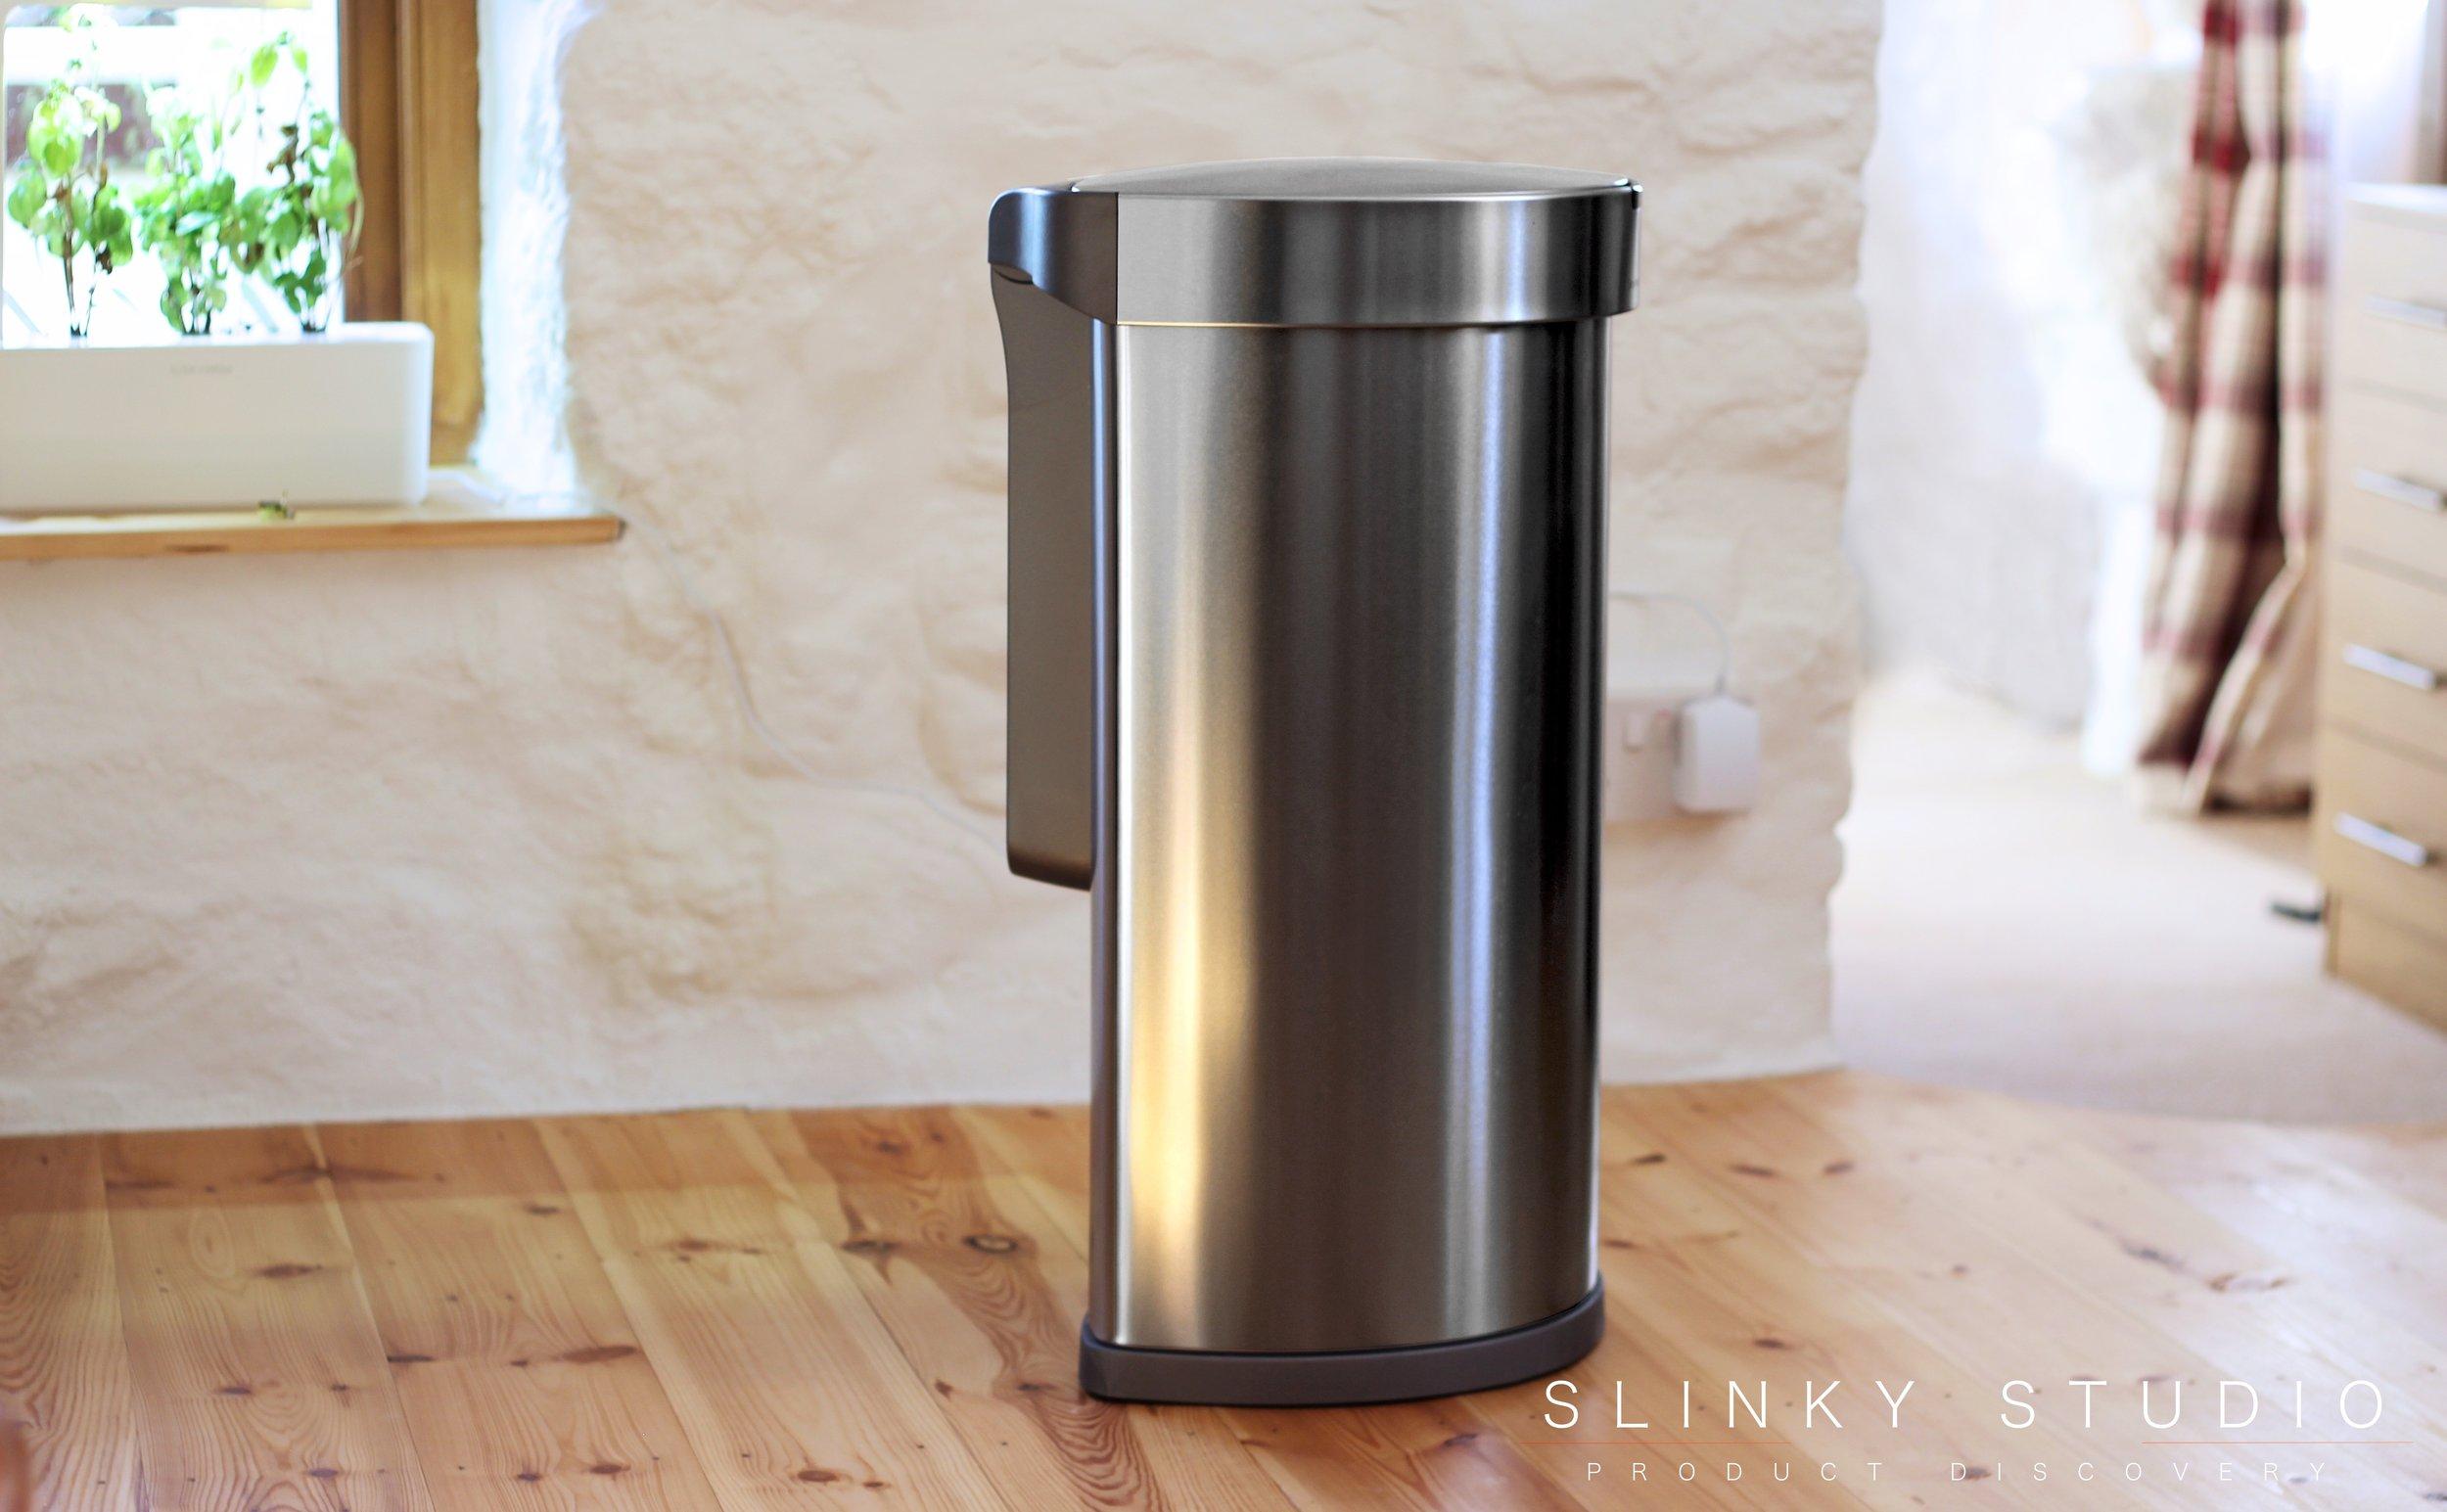 simplehuman 45 litre Semi-Round Sensor Bin Side View.jpg